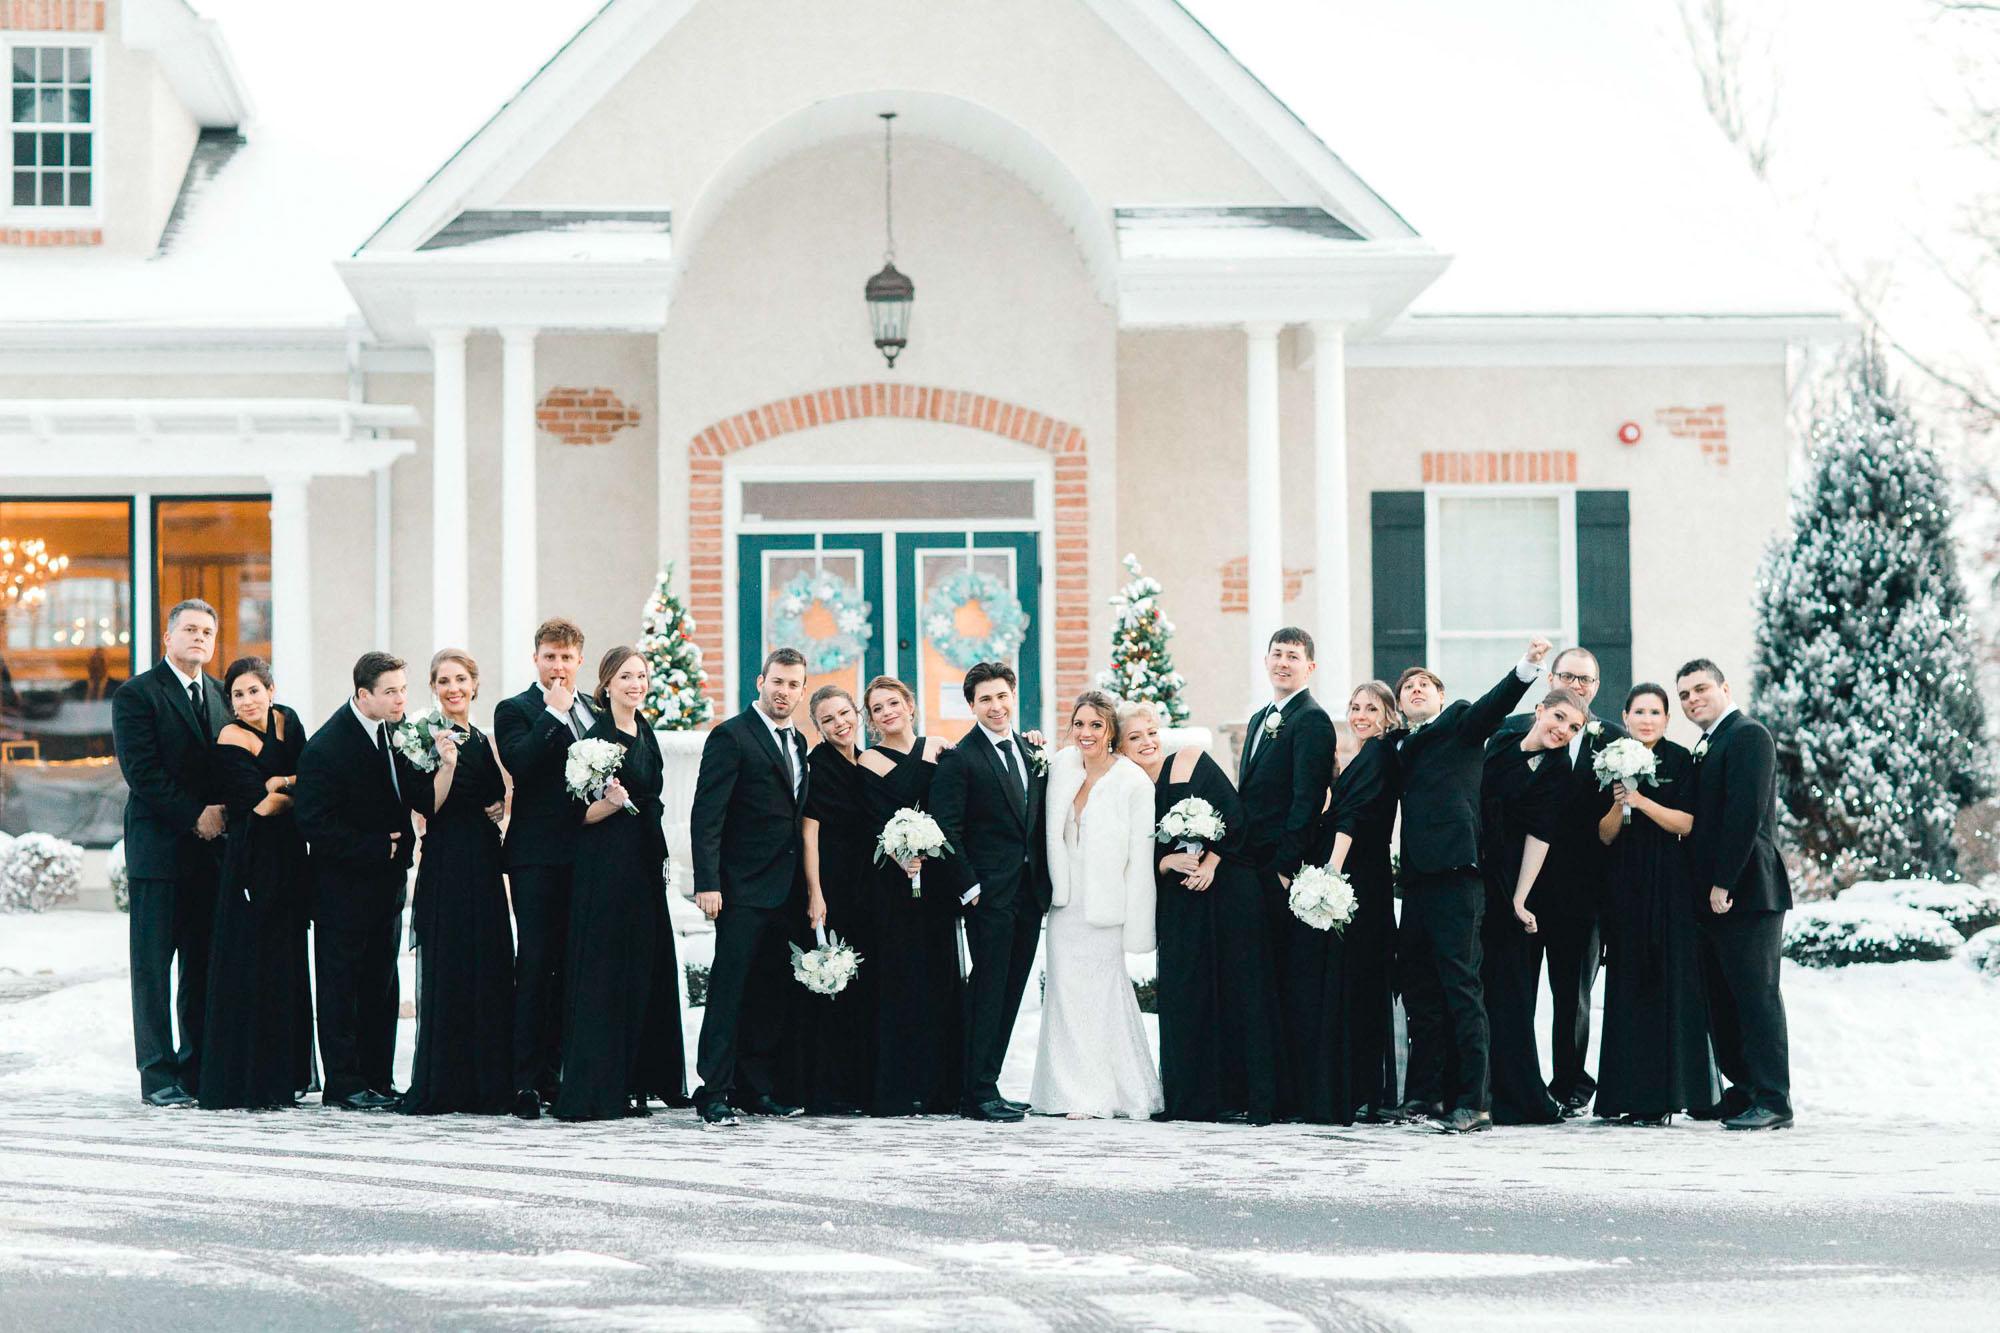 snowy-sand-springs-country-club-drums-pa-christmas-wedding-24920.jpg